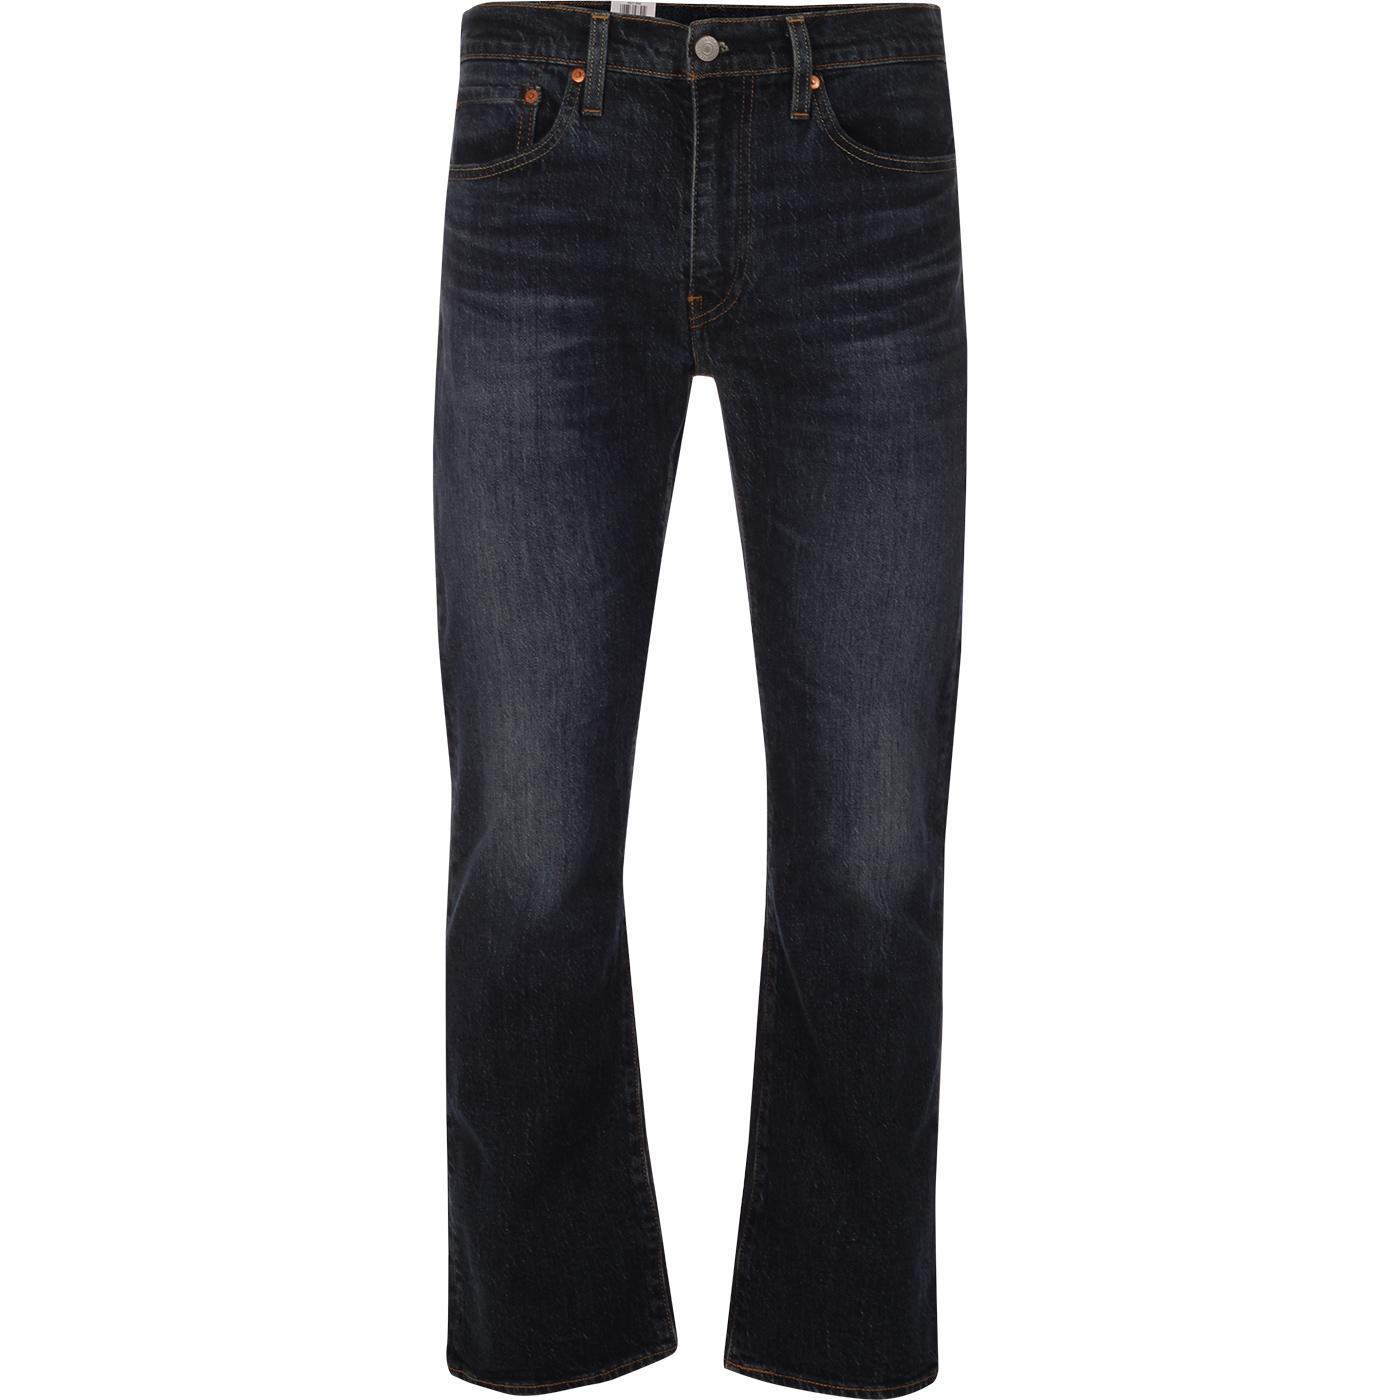 LEVI'S 527 Slim Bootcut Jeans (Durian Super Tint)